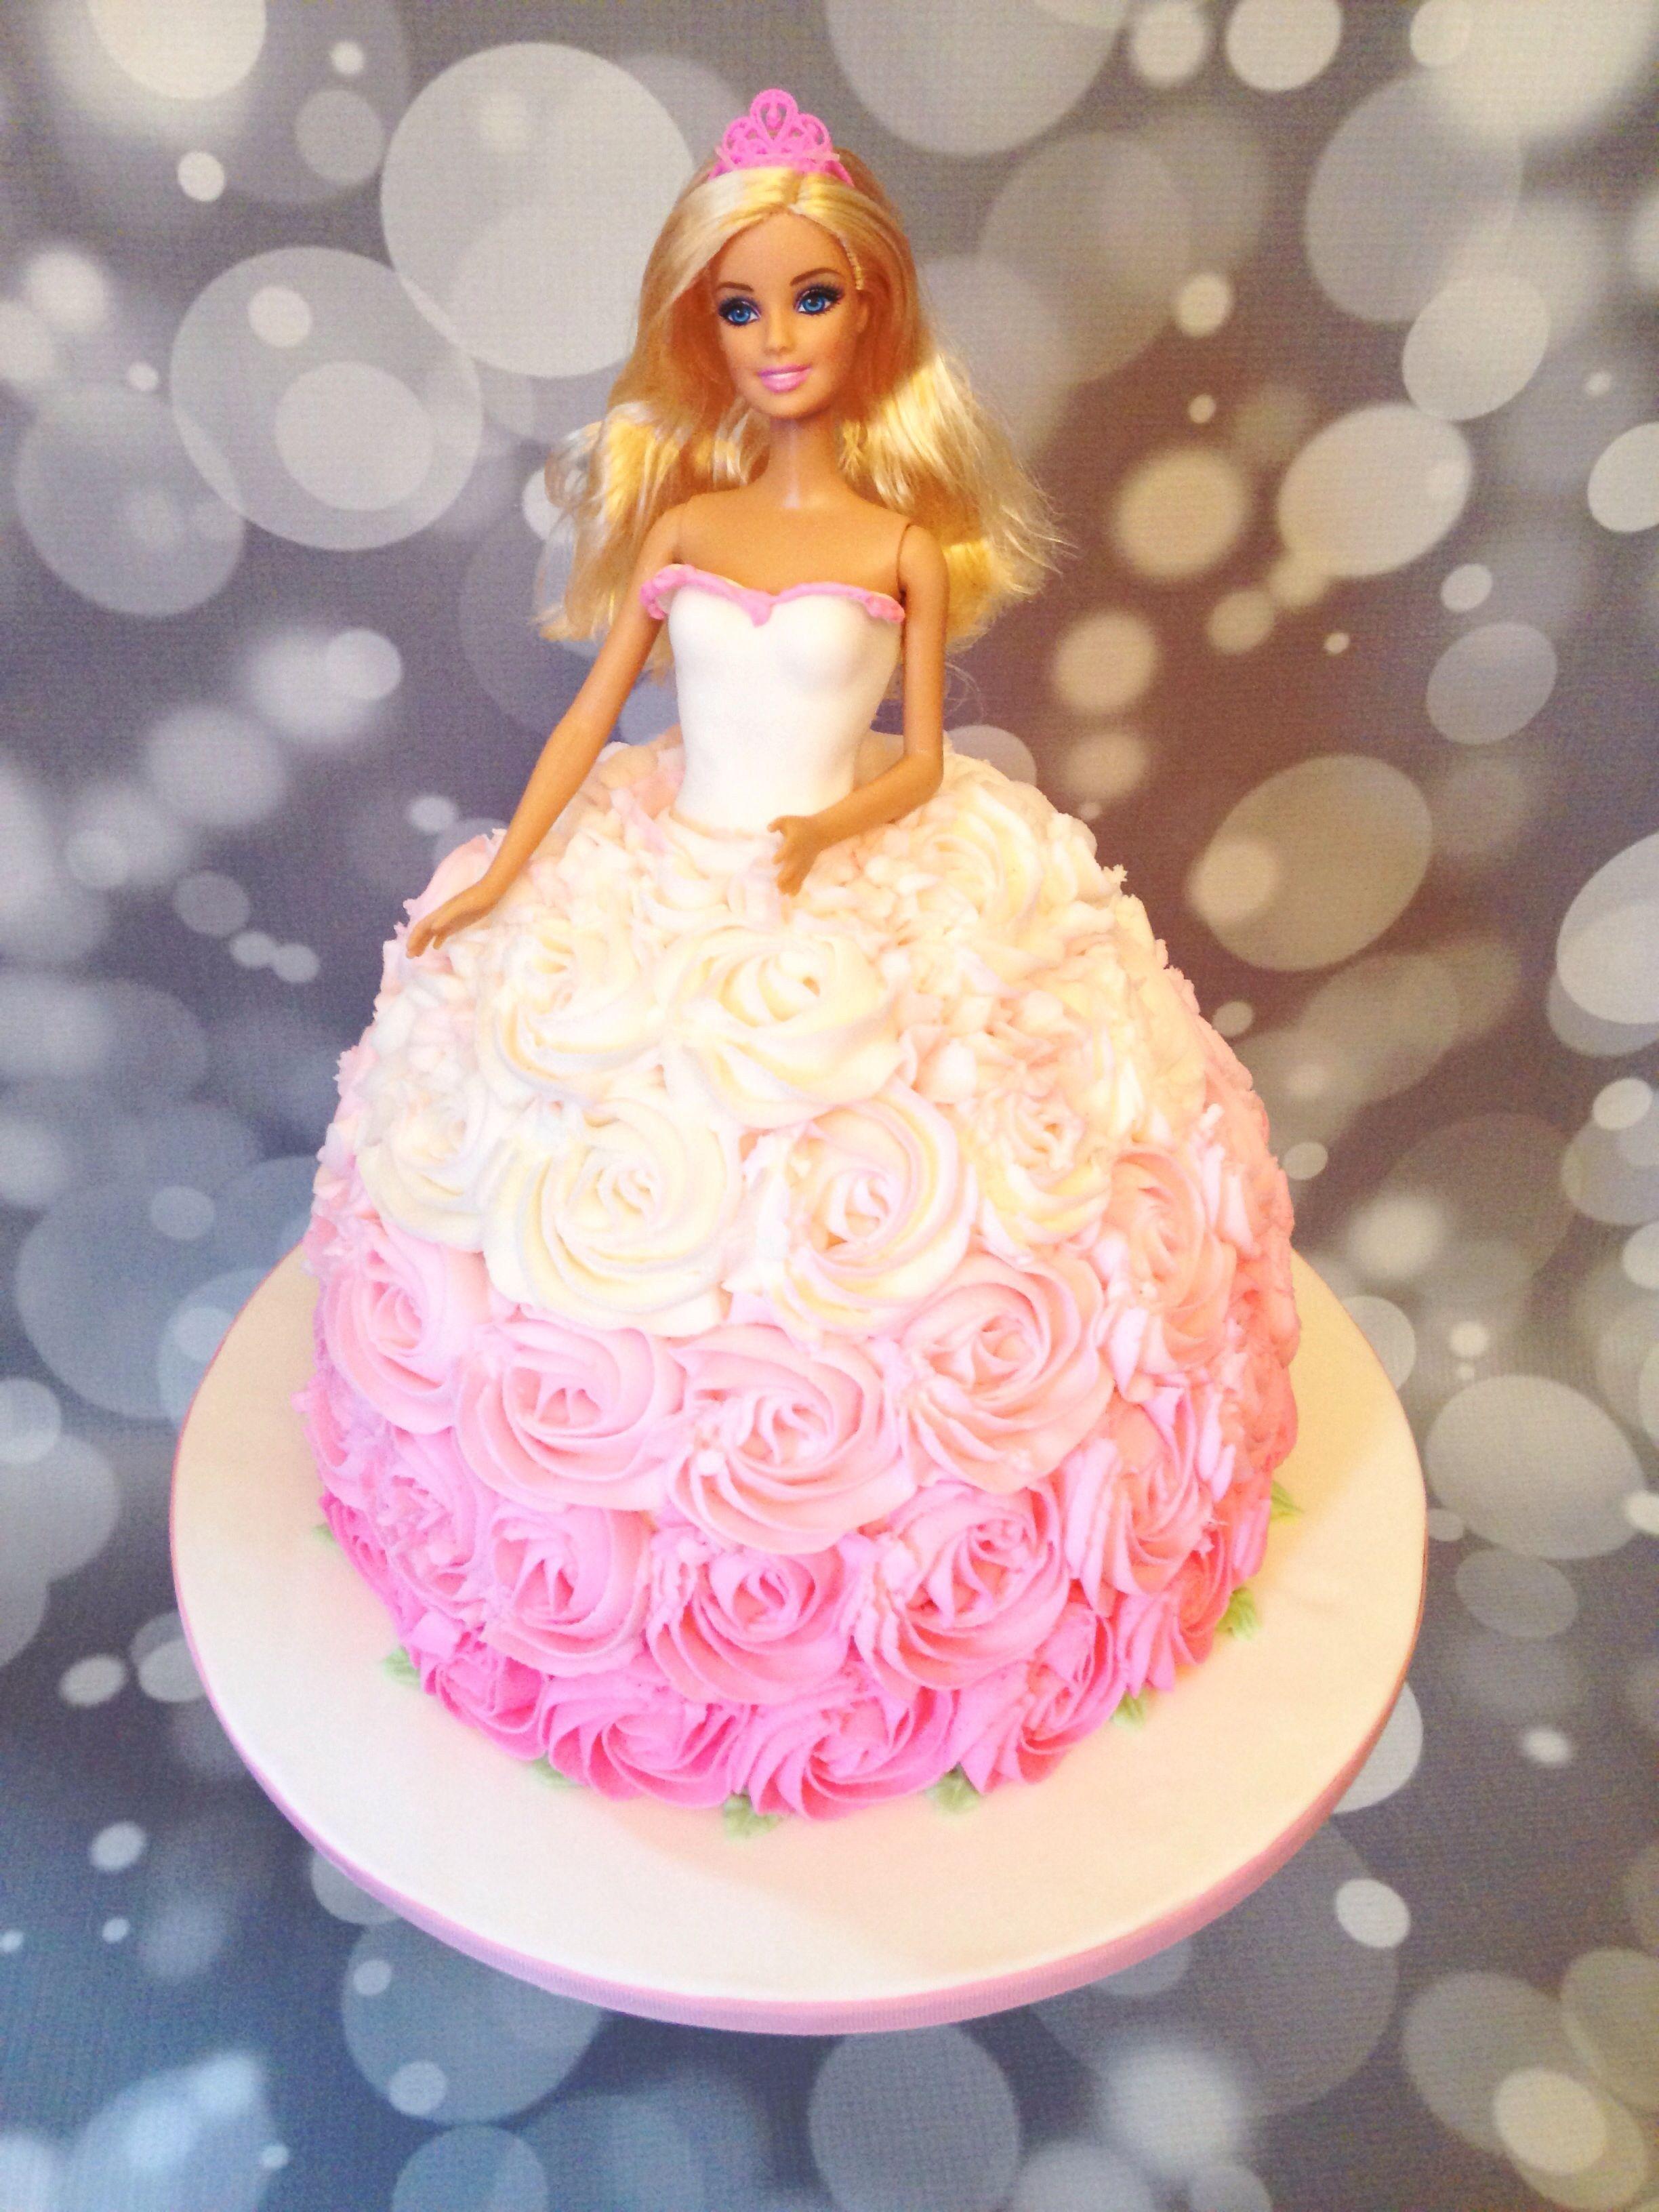 walmart barbie cake decorating set